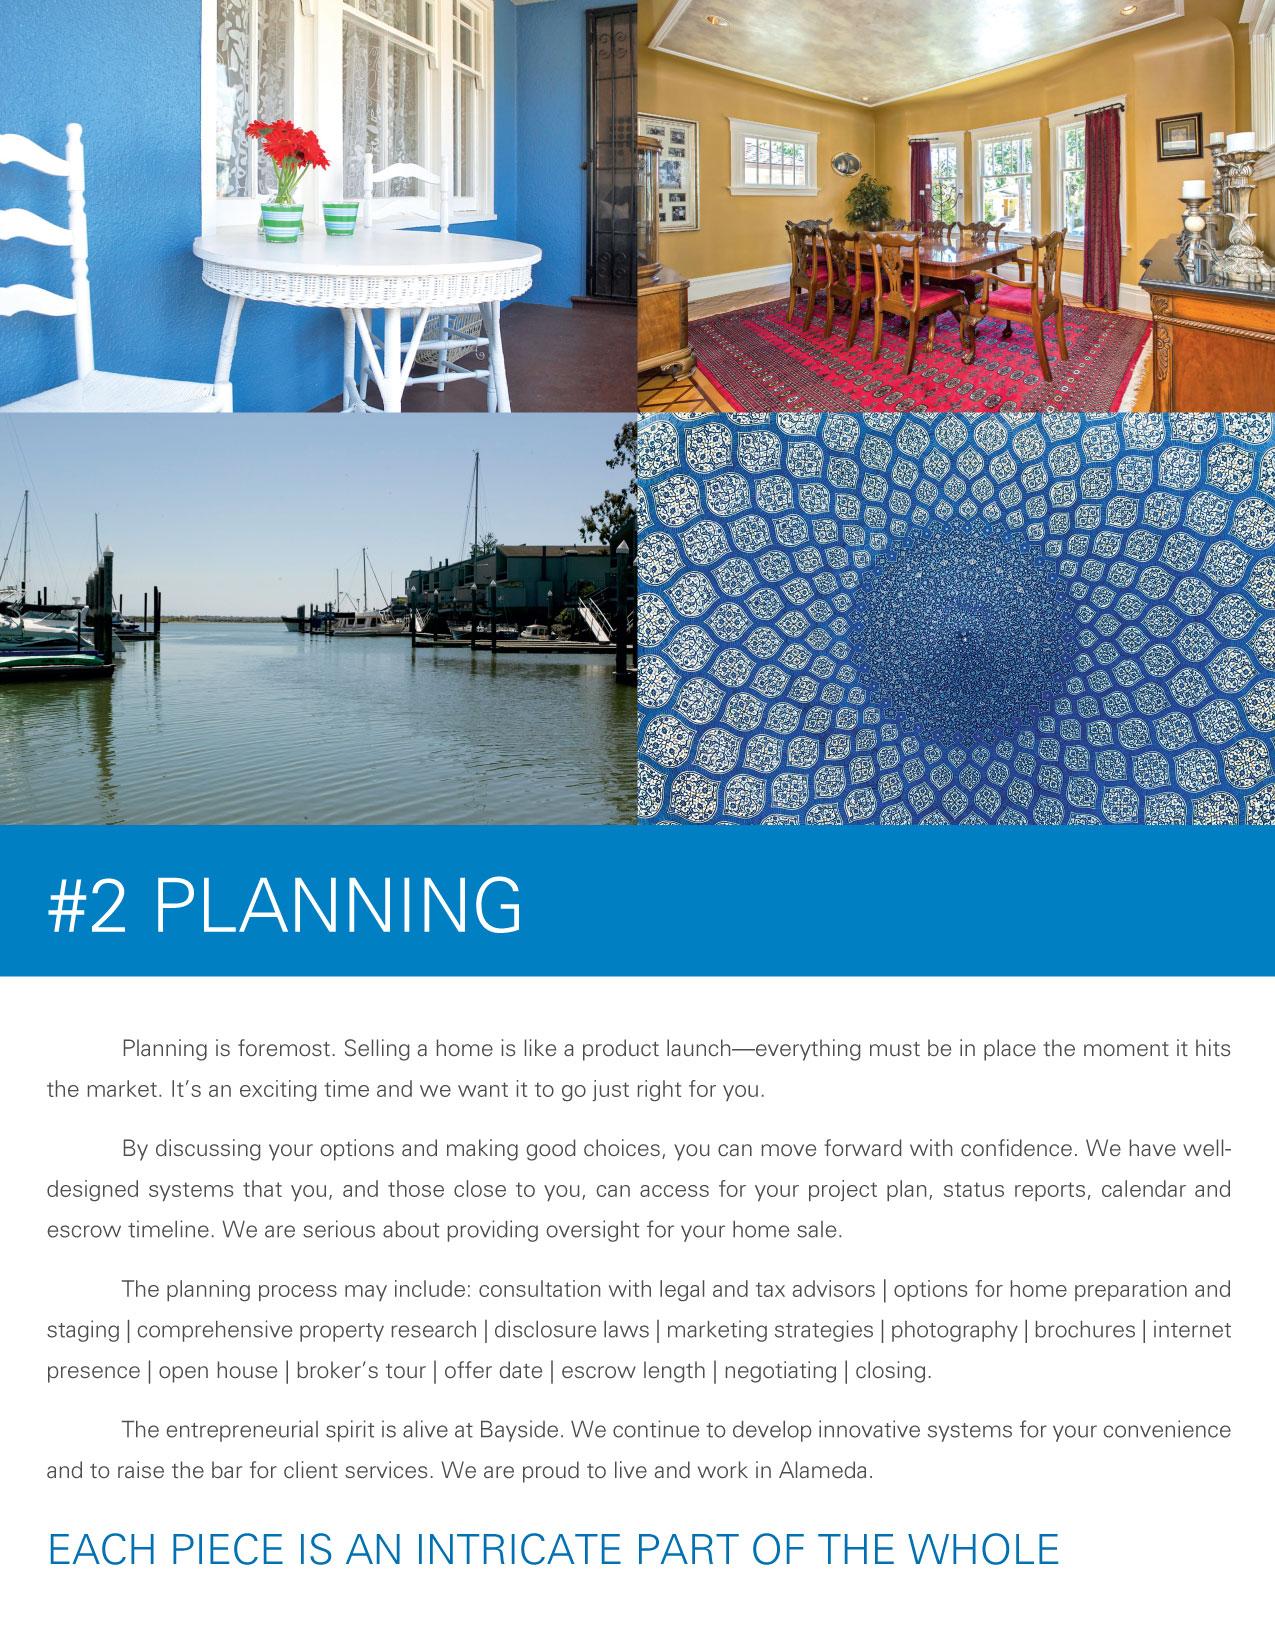 Listing Presentation - #2 Planning